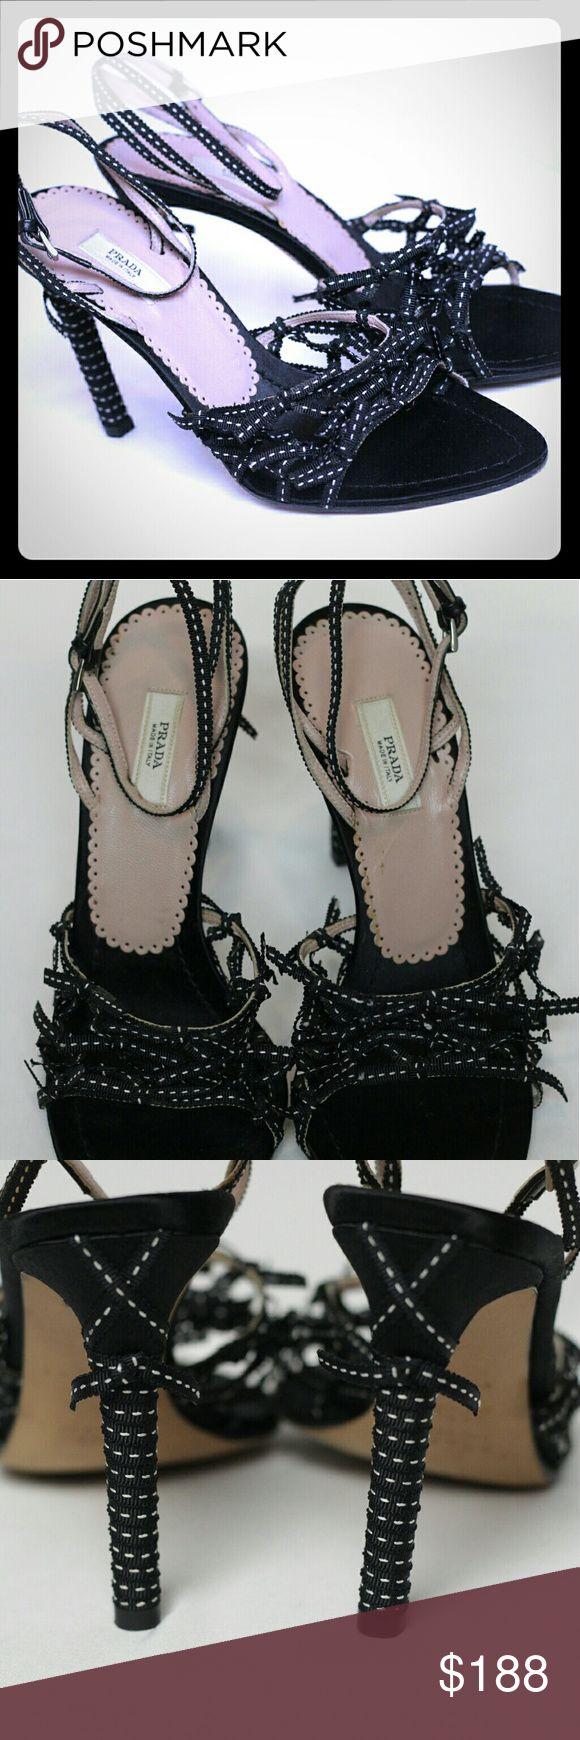 "PRADA 🖤 Black & white ribbons, sandals, perfect condition. 4"" heel. 🖤 Inv #1027 Prada Shoes Sandals"